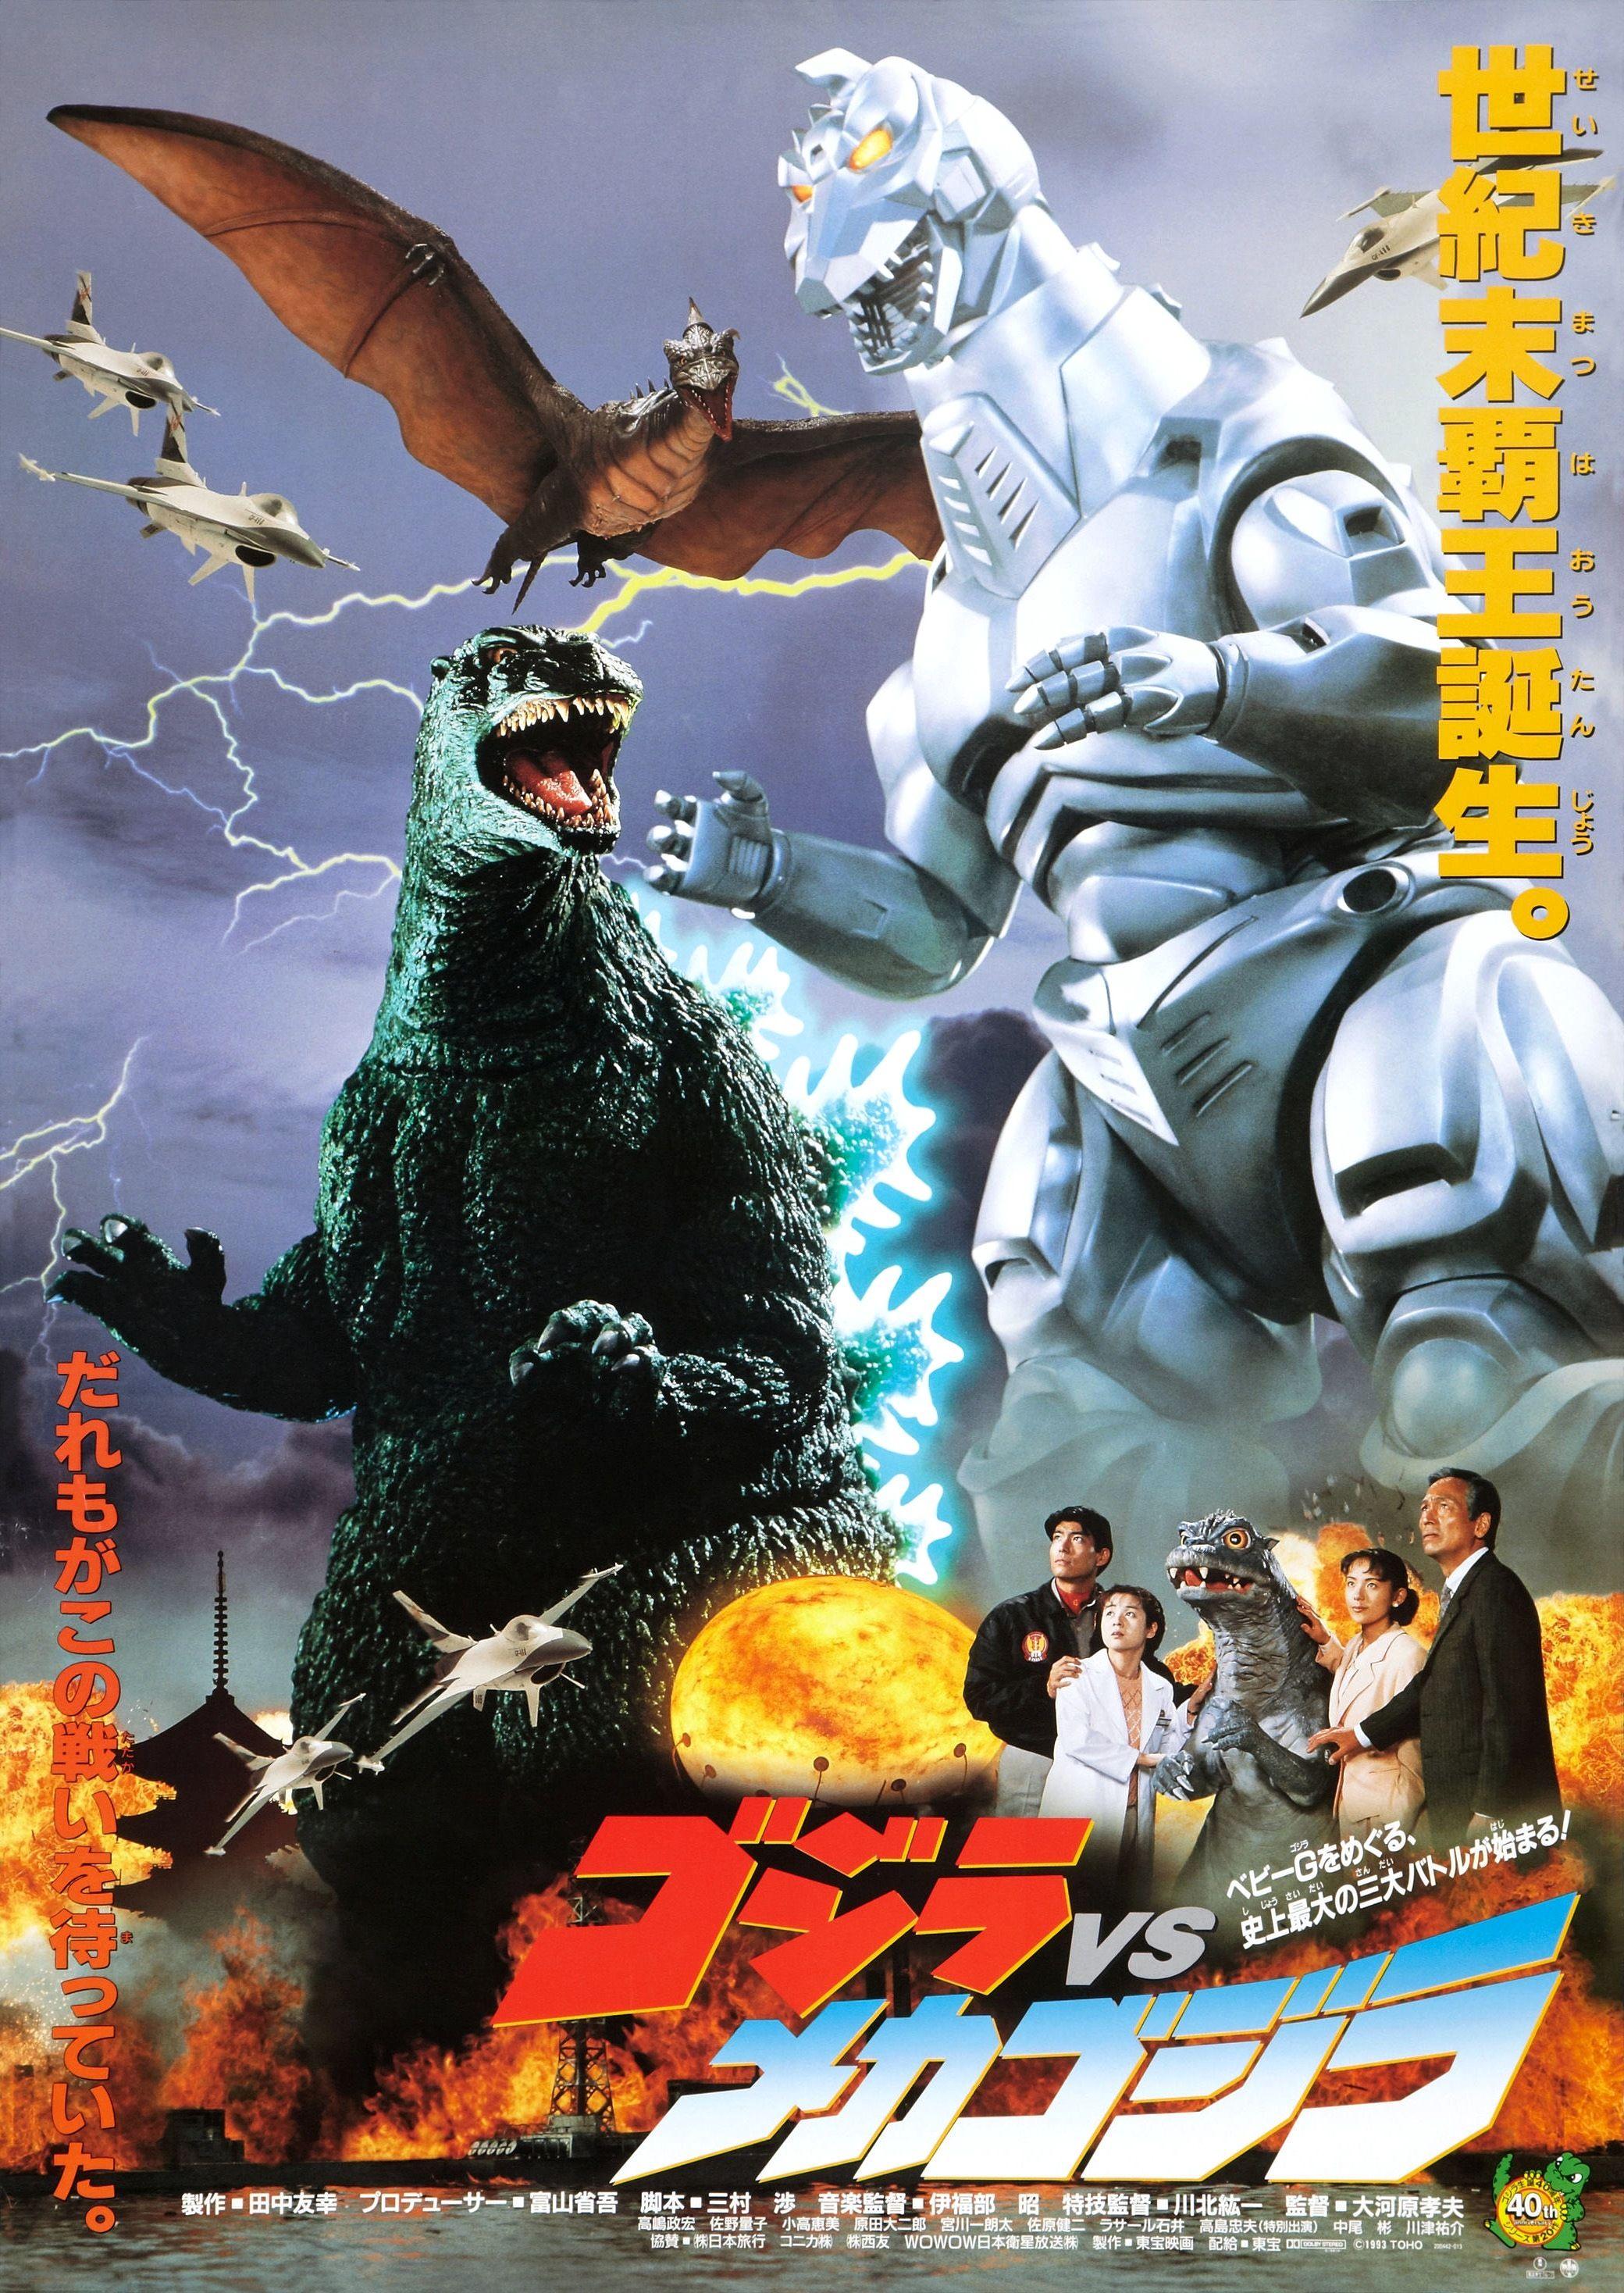 Godzilla vs. Mechagodzilla 2. Japanese FilmJapanese PosterHd MoviesMovie  FilmMovies FreeMovies OnlineMonster ...